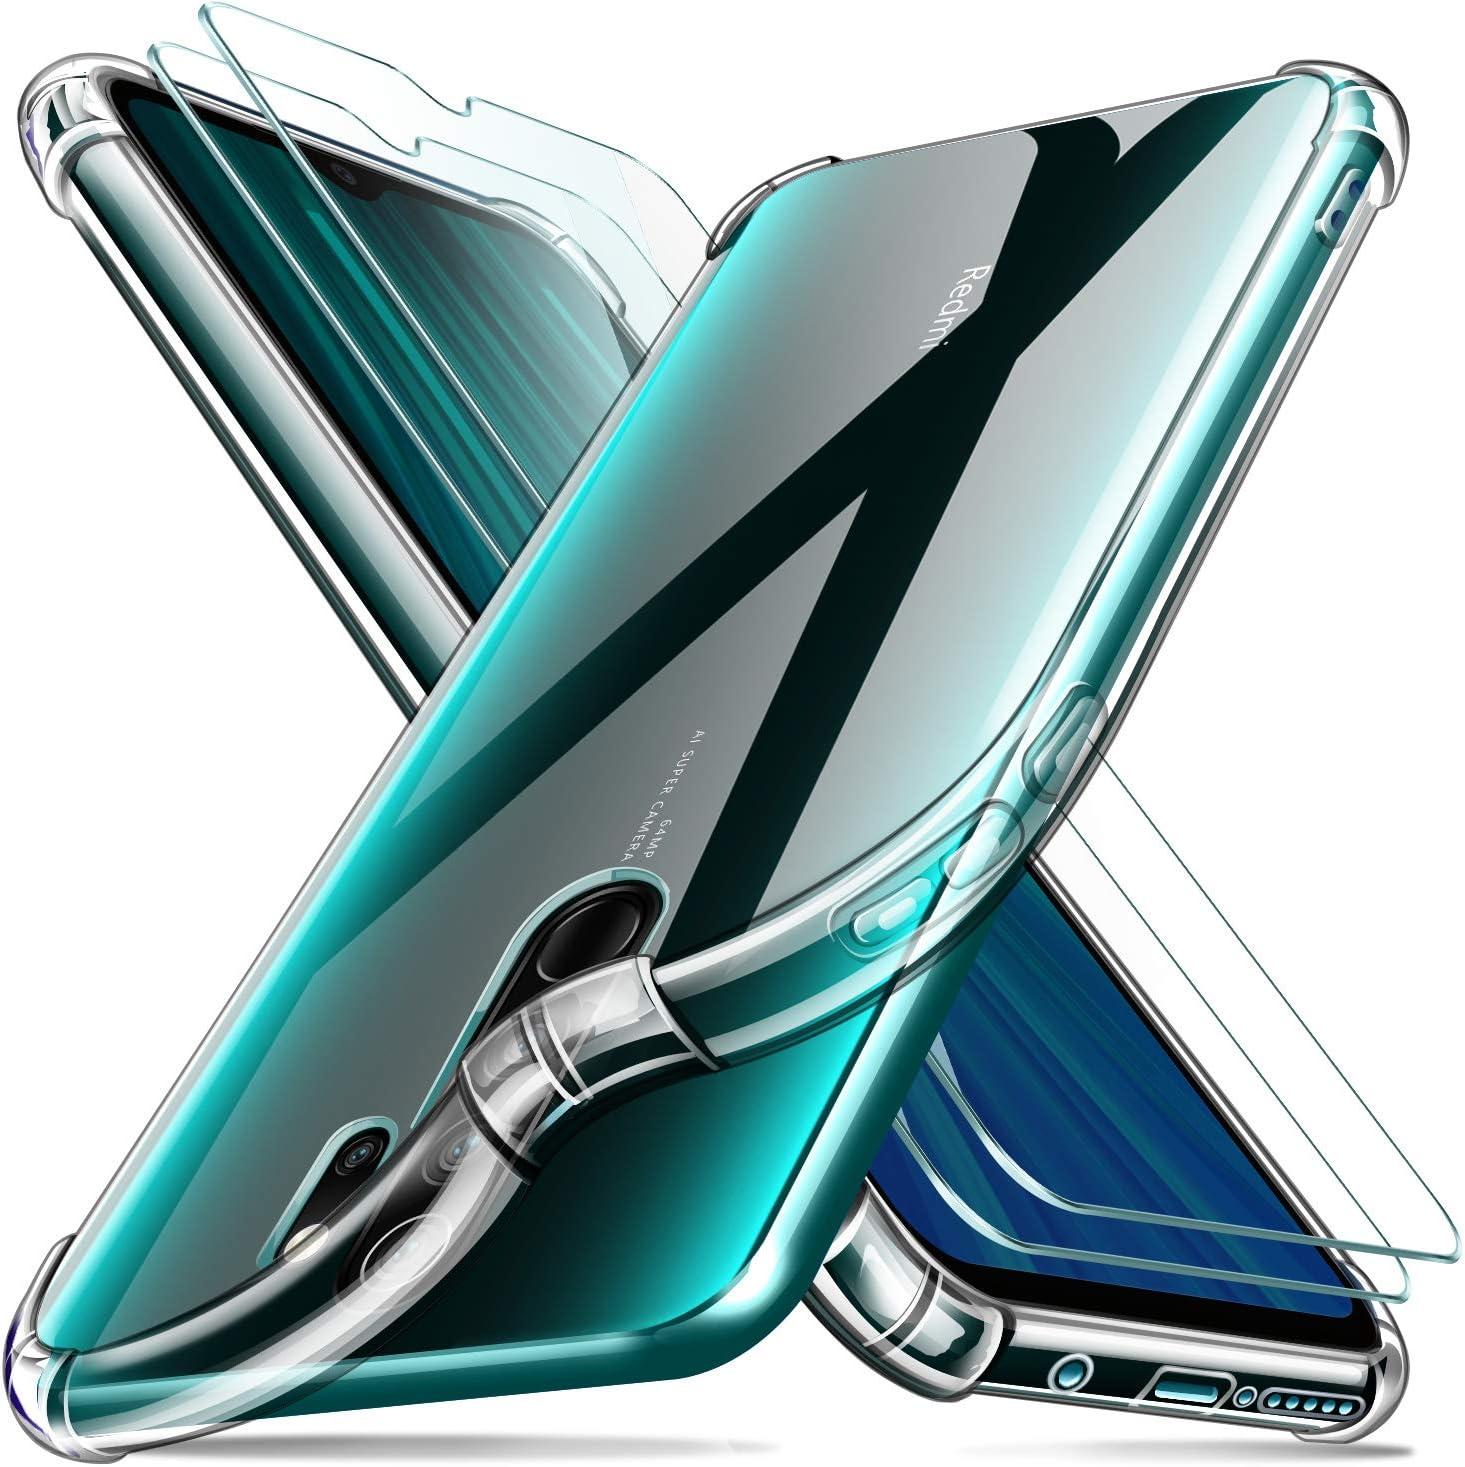 Leathlux Funda Xiaomi Redmi Note 8 Pro + [2 Pack] Cristal Templado Protector de Pantalla, Ultra Fina Silicona Transparente TPU Carcasa Protector Airbag Anti-Choque Anti-arañazos Caso Xiaomi Note 8 Pro